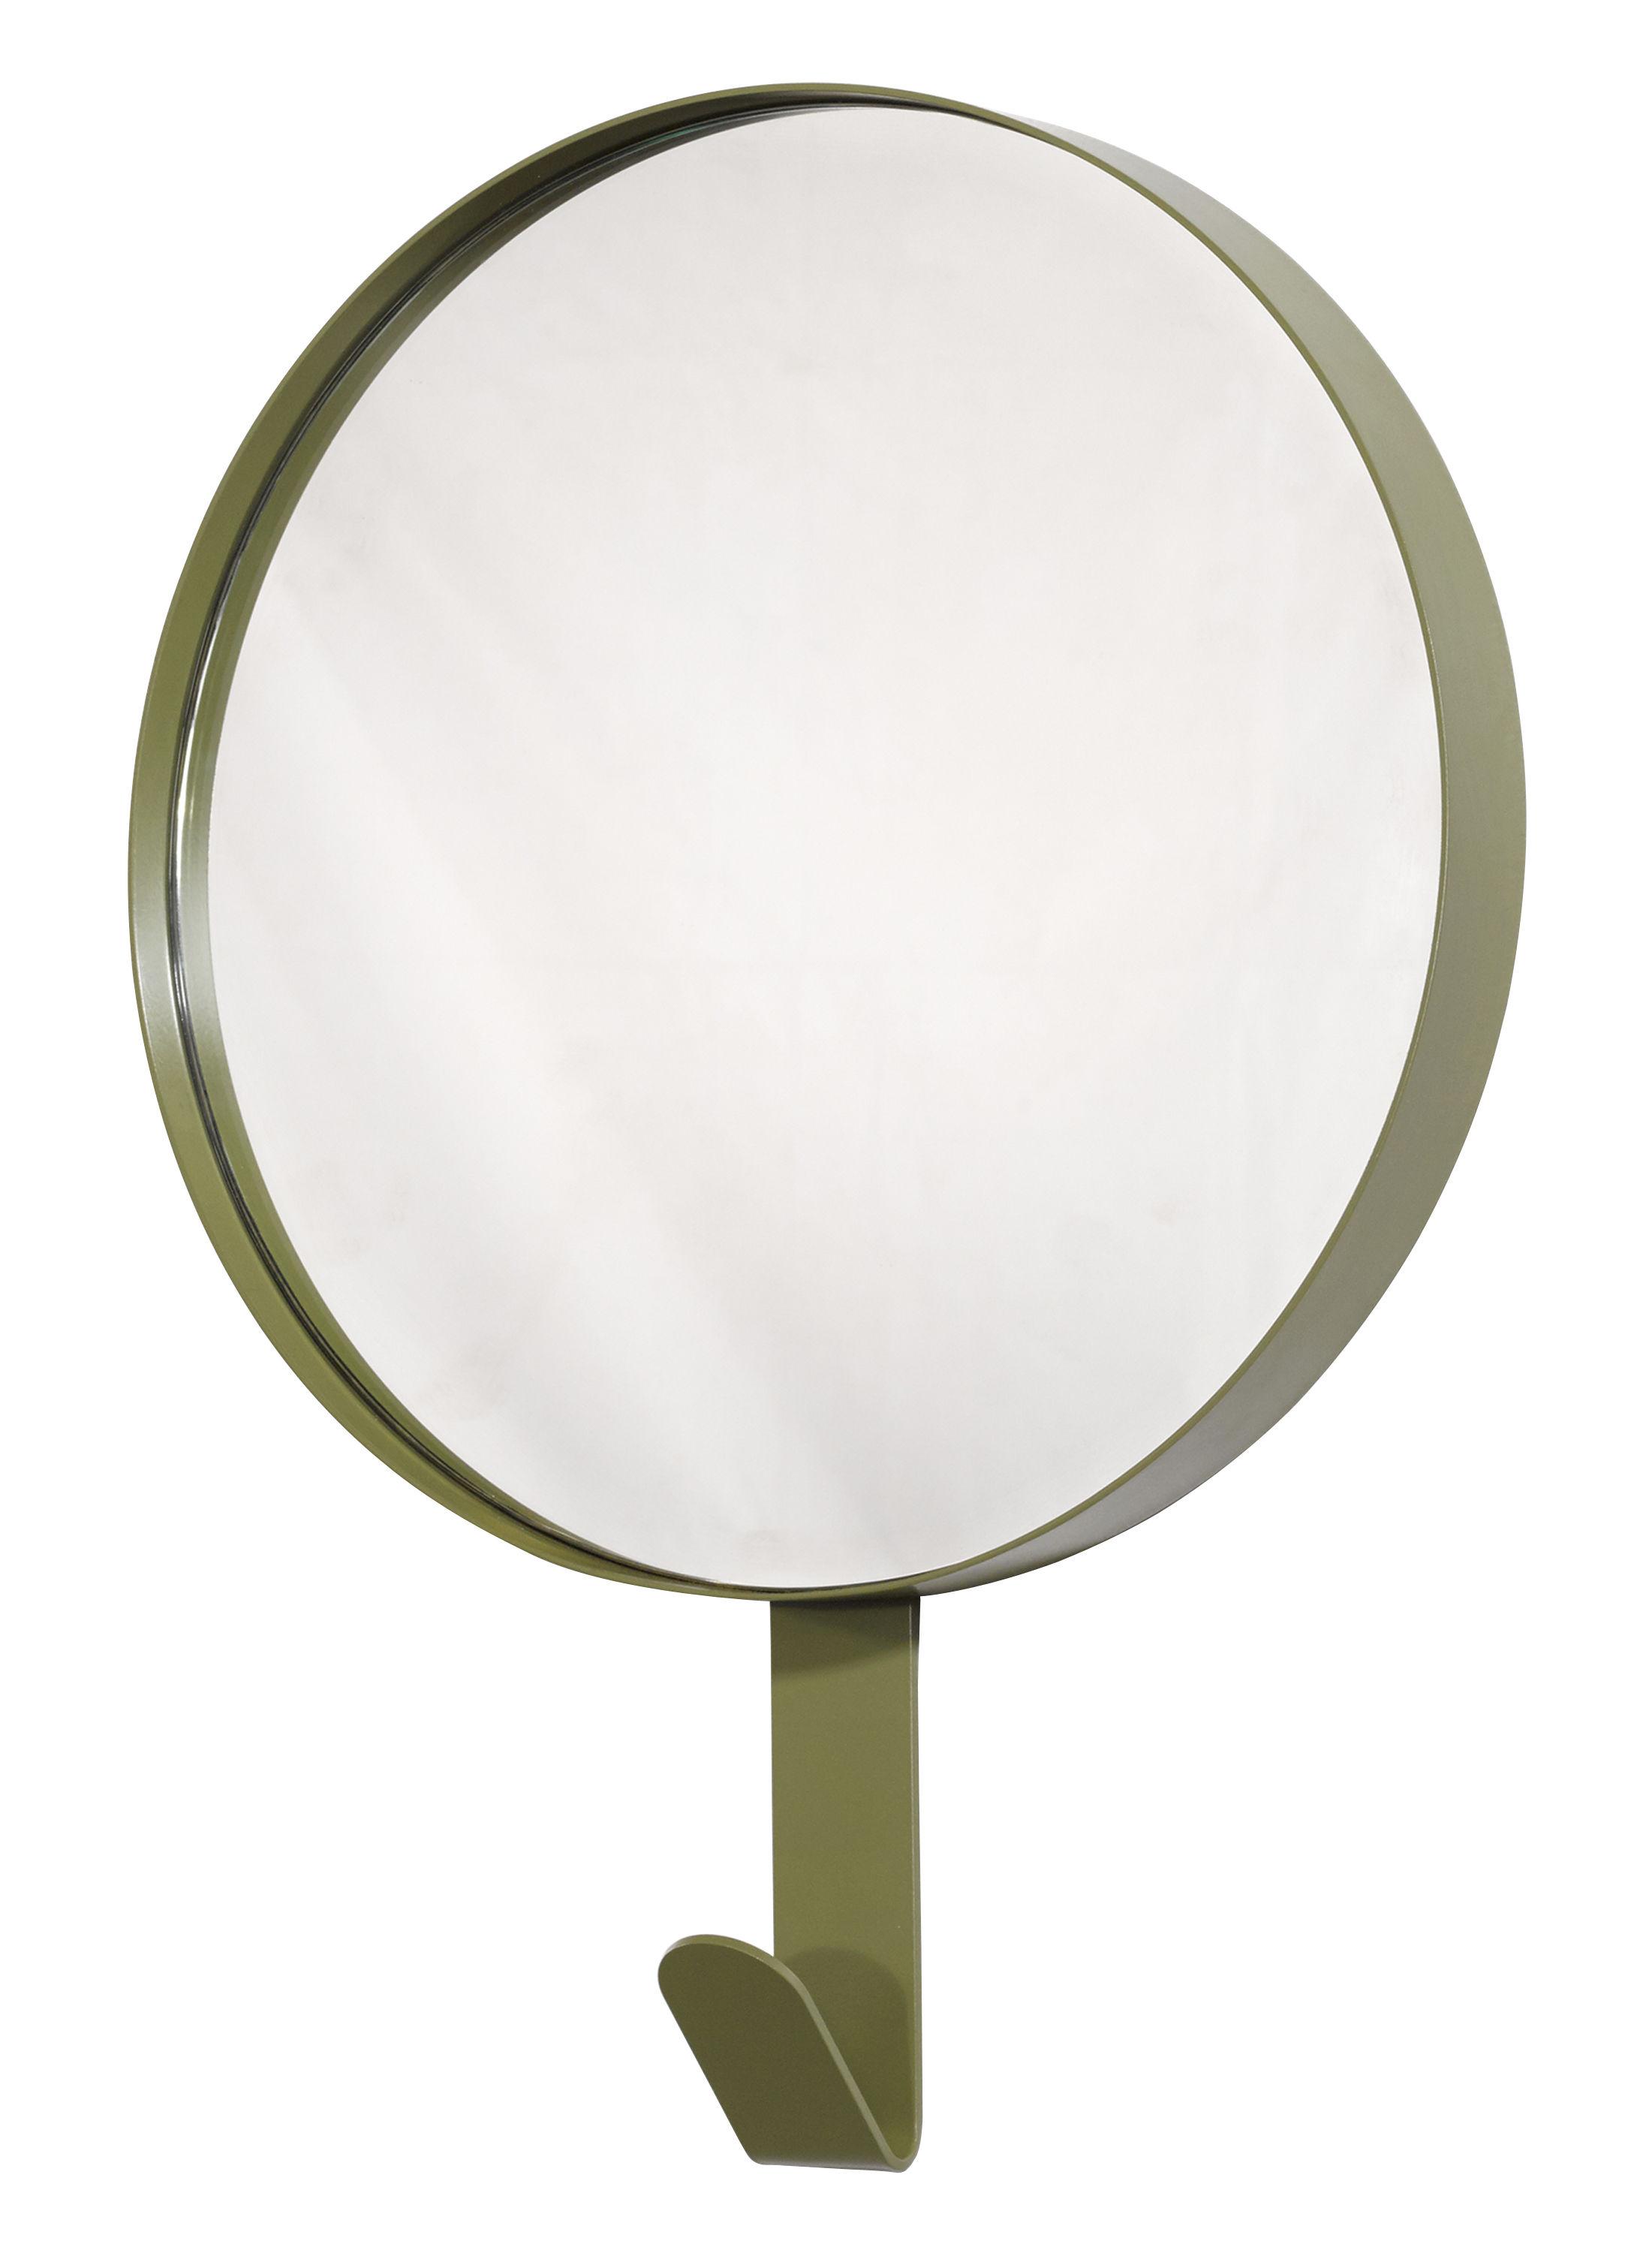 Hook mirror hook 37 cm kaki by universo positivo for Mirror hooks